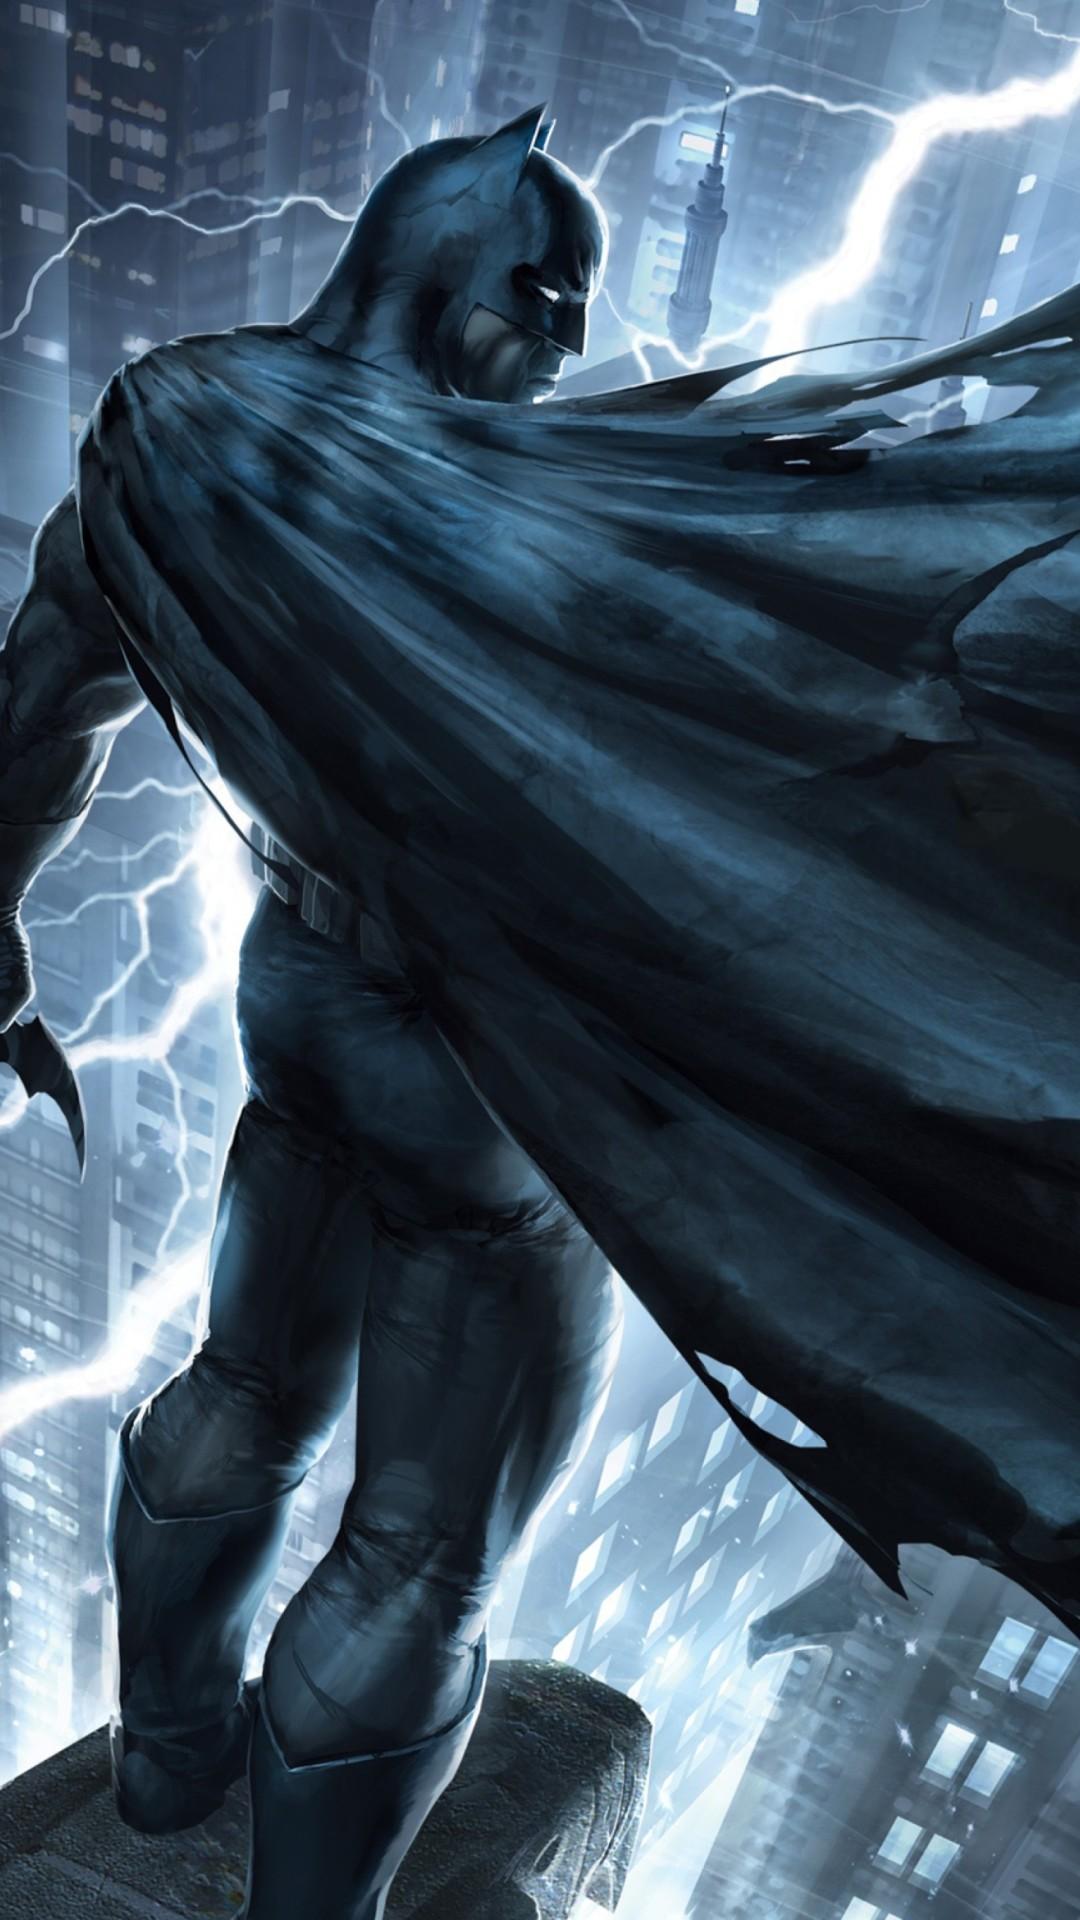 batman knight dark returns iphone wallpapers 1080 1920 plus film pixelstalk mobile backgrounds wallpapersafari wallpaperaccess